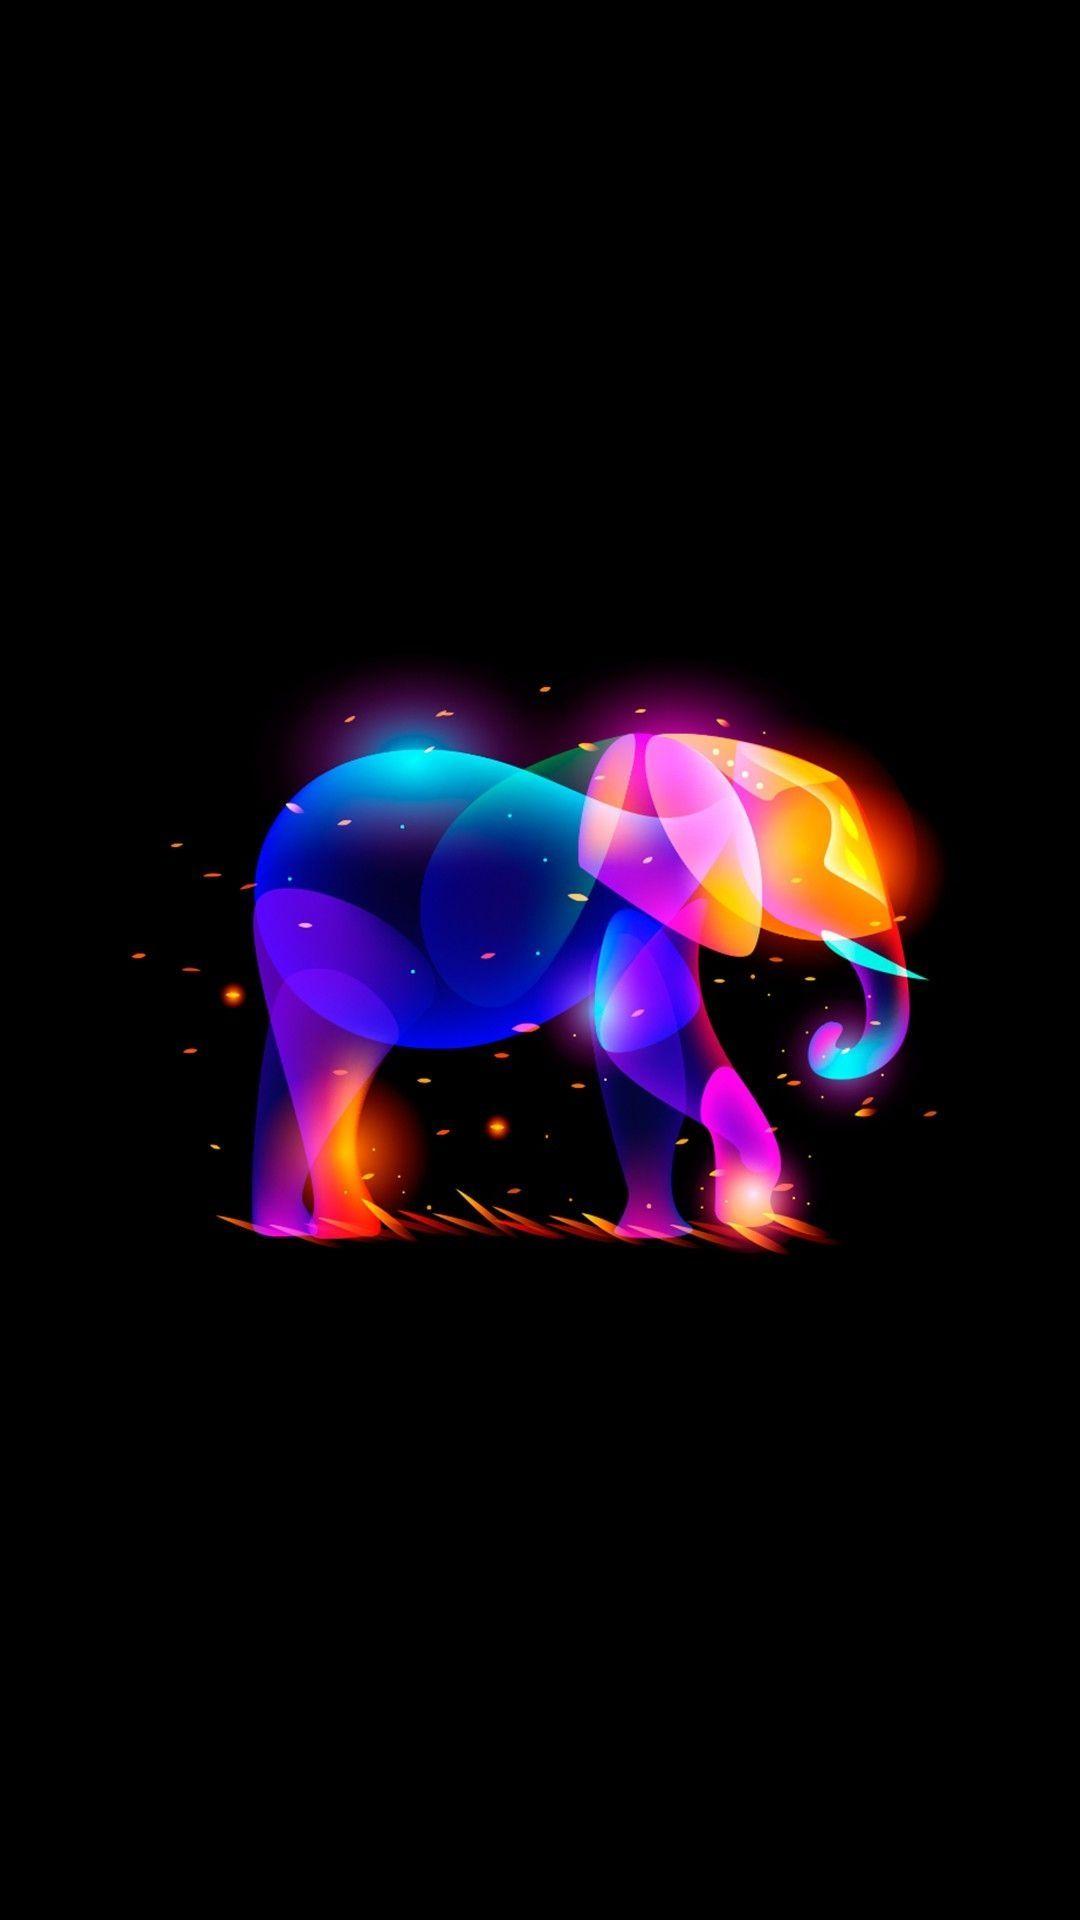 Elephant iPhone xs wallpaper download